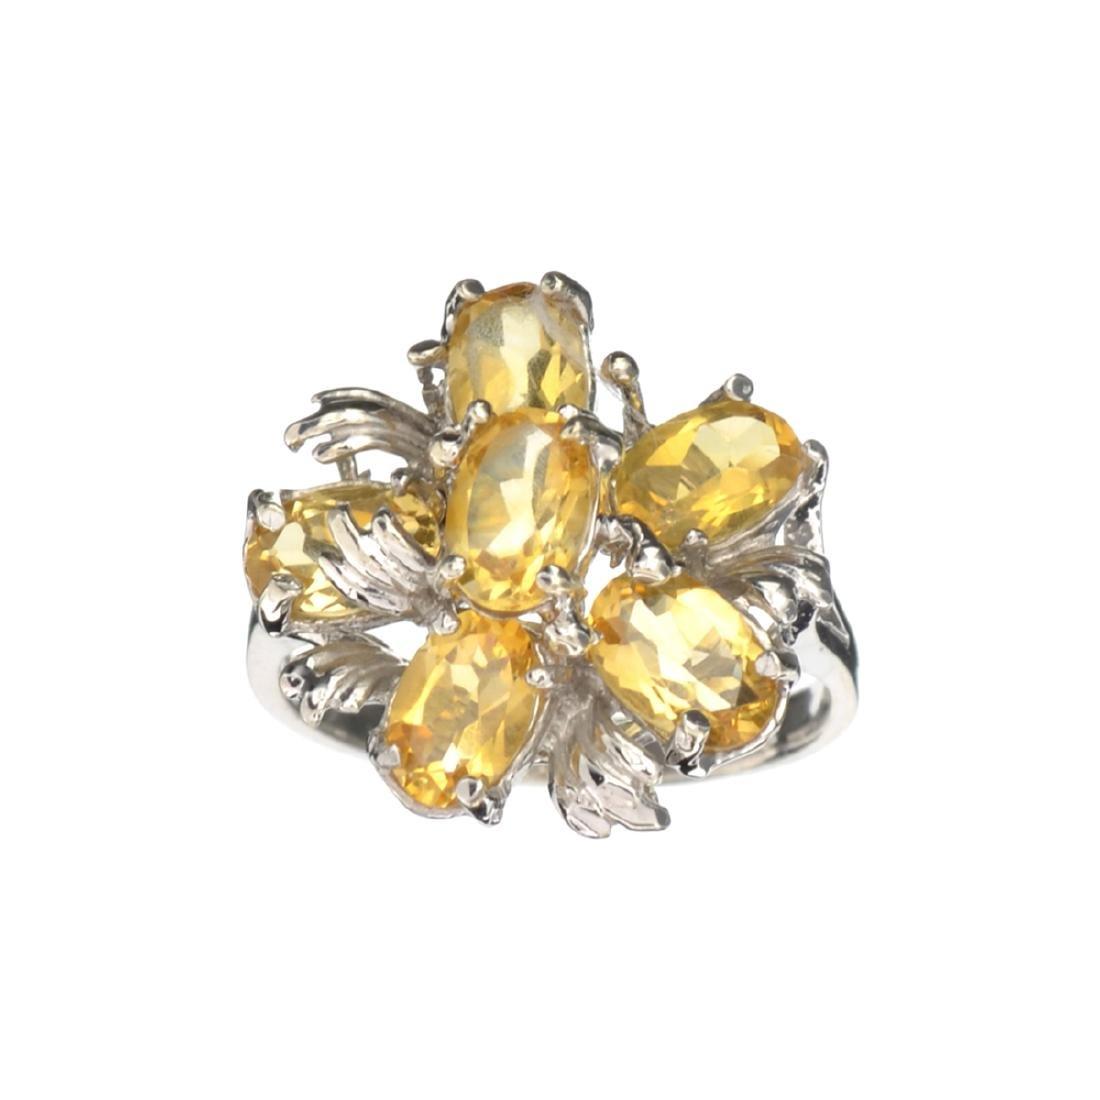 APP: 0.4k Fine Jewelry Designer Sebastian, Oval Cut